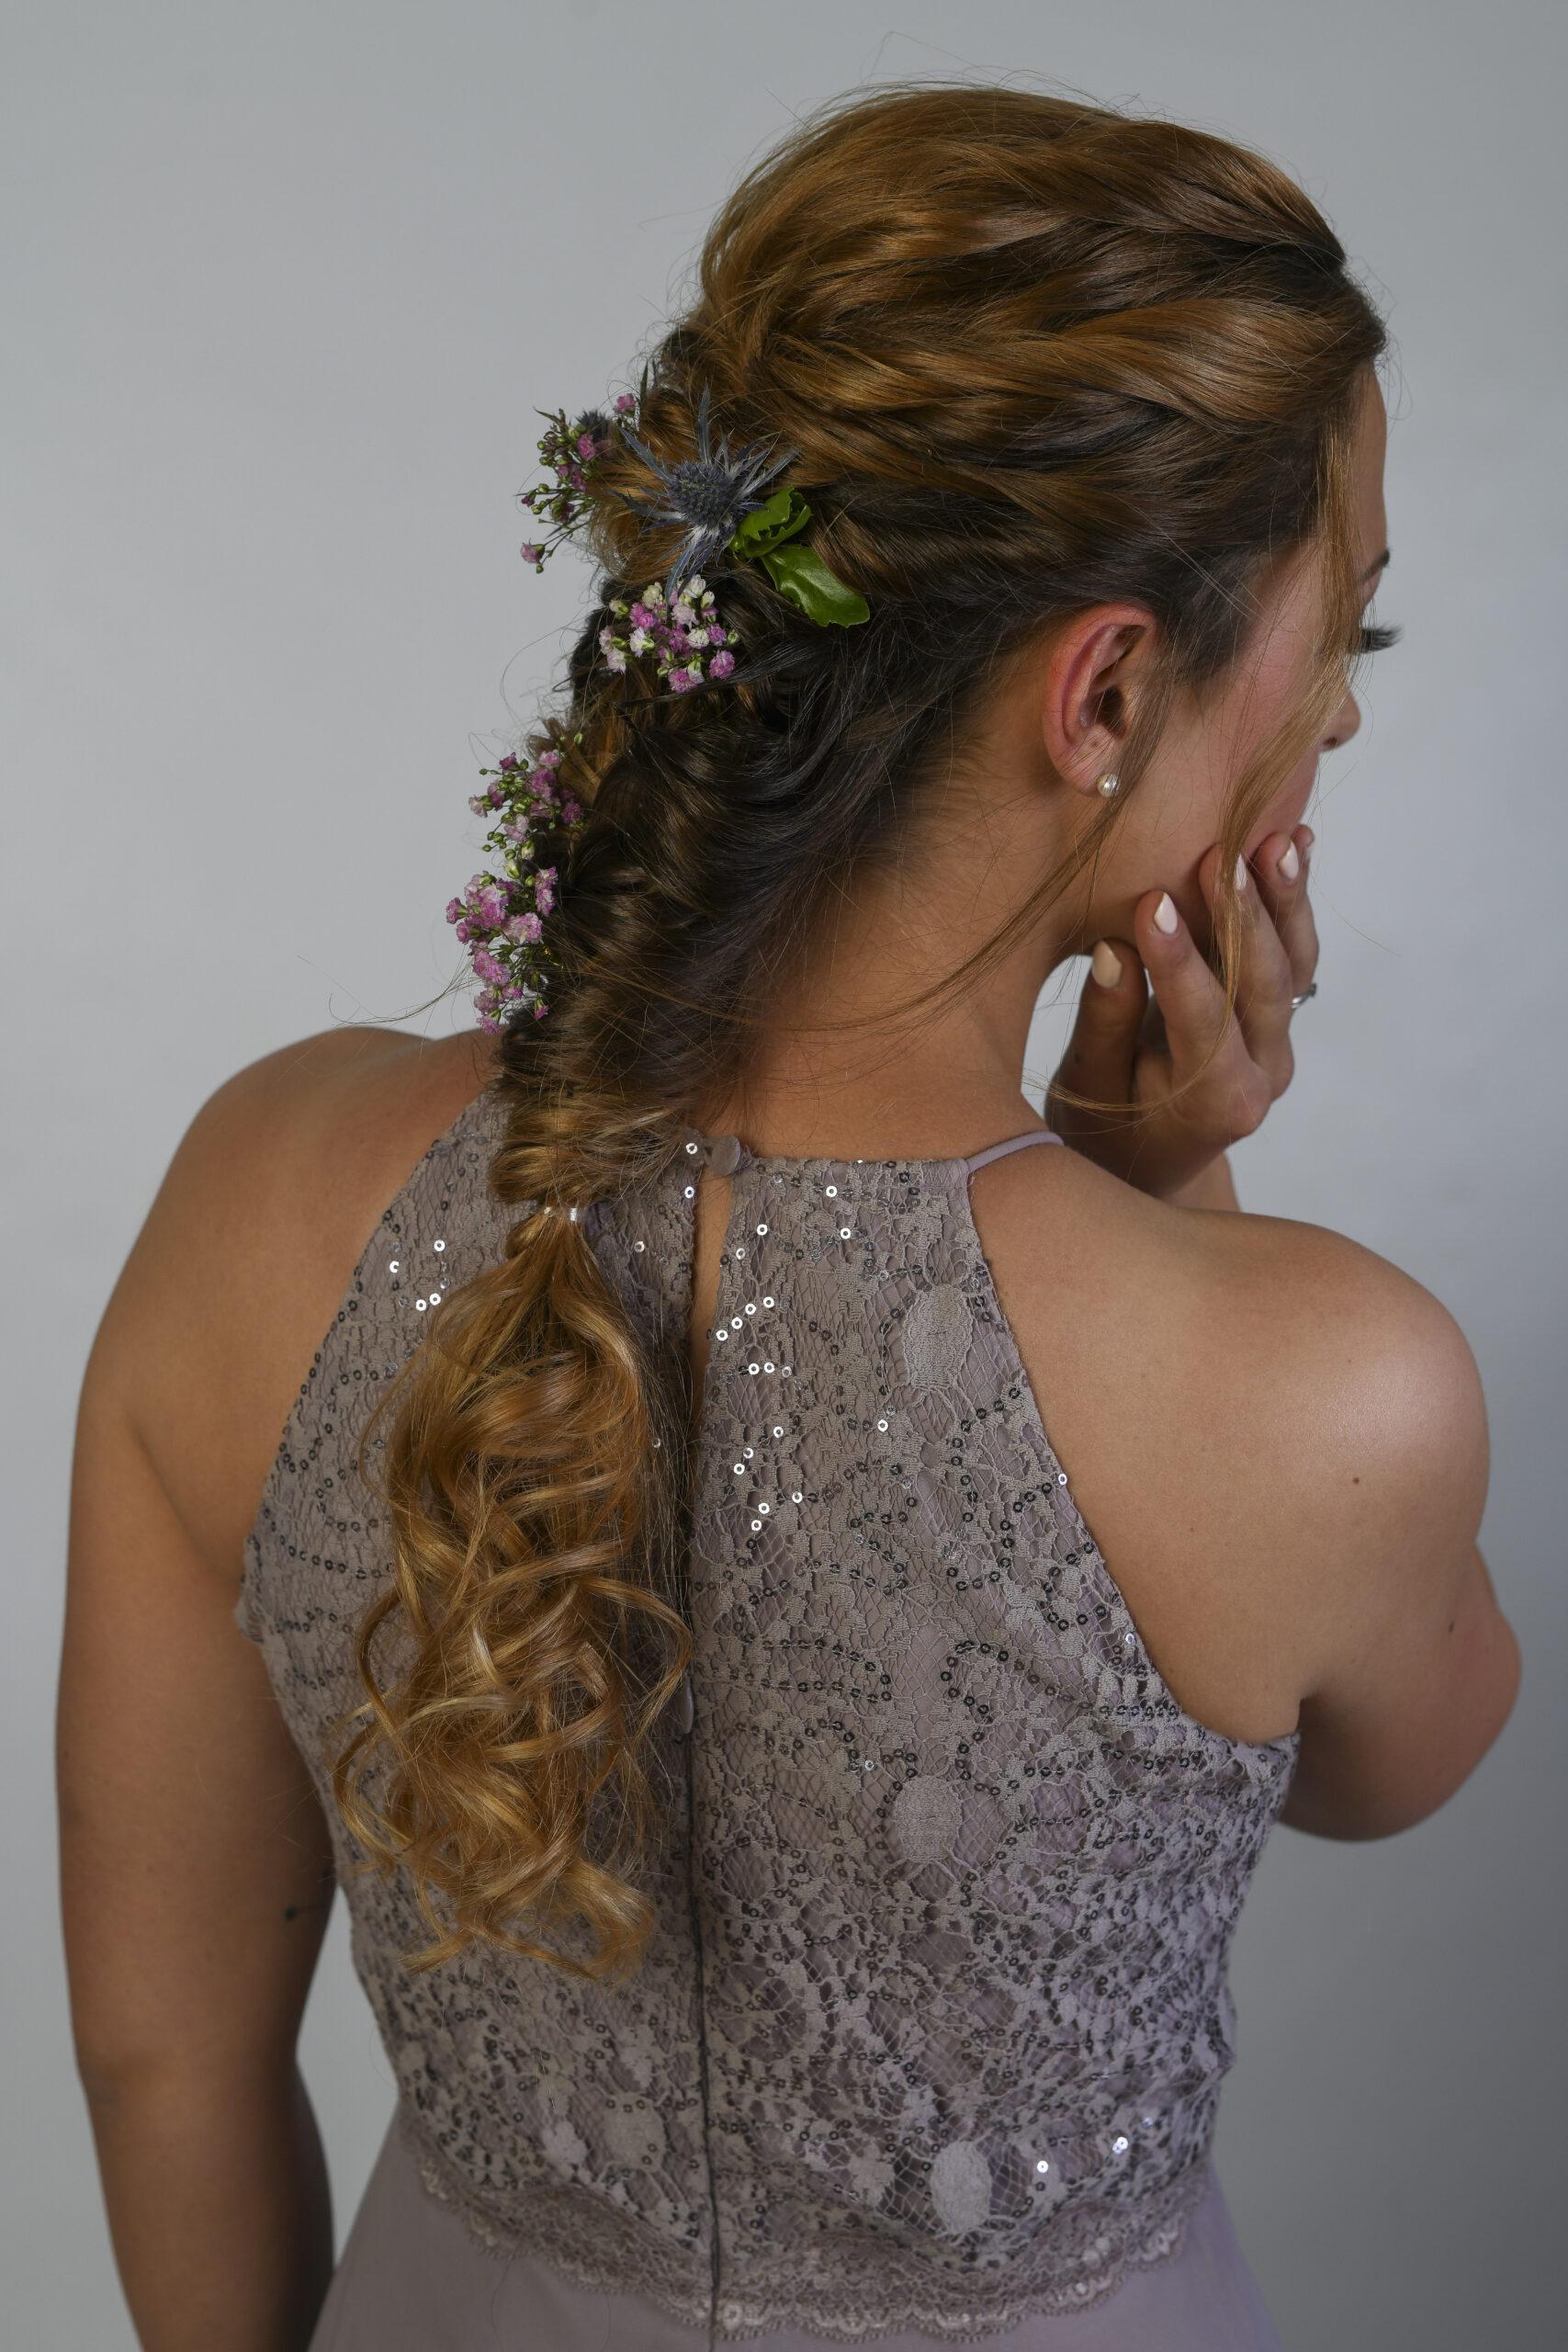 Dezentes Braut Make-up 1